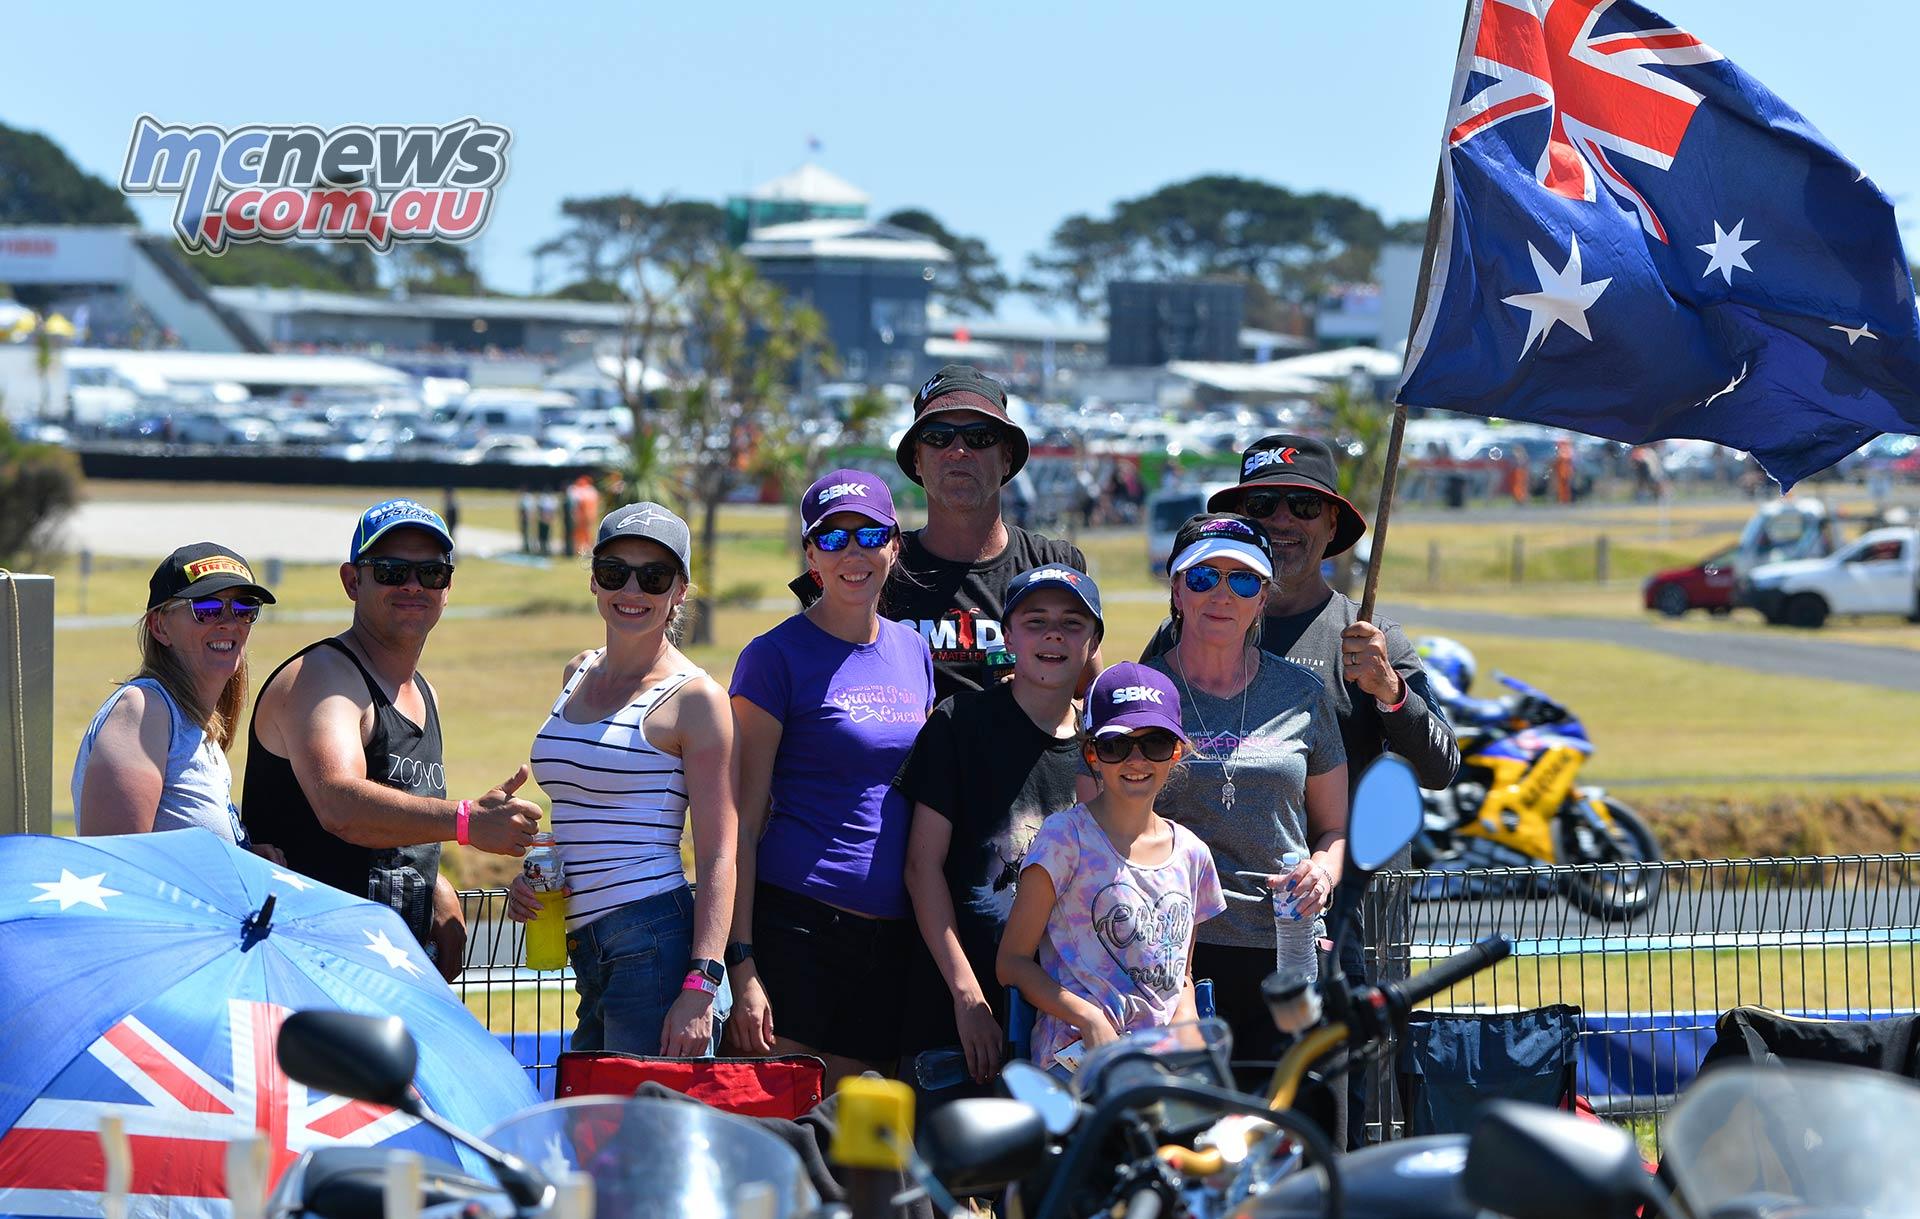 WSBK Phillip Island Action Crowd GeeBee